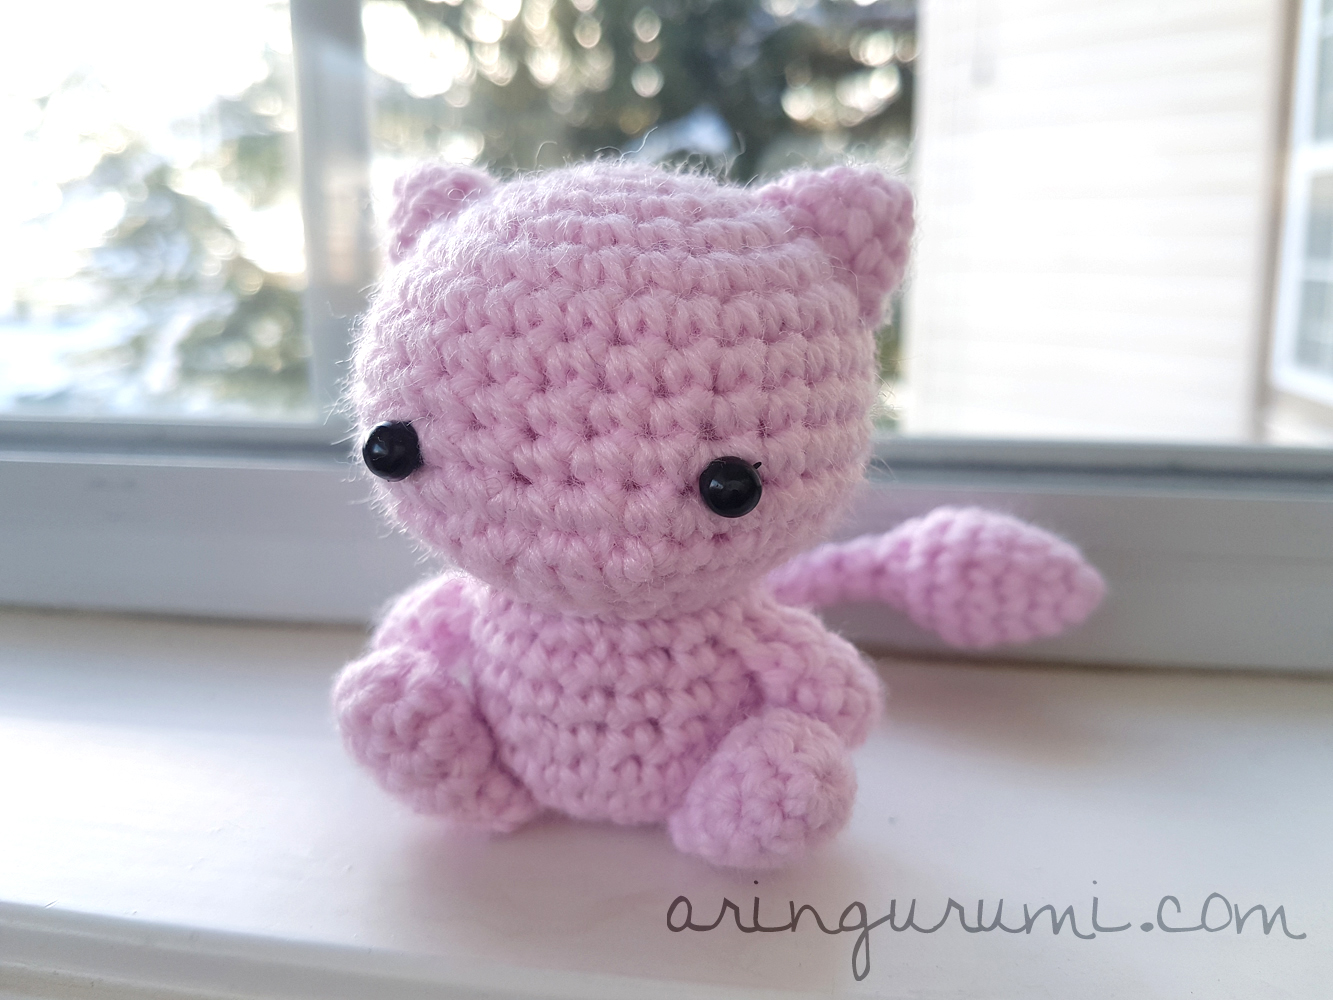 Mew Amigurumi Crochet Plush Pokemon Plushie On Storenvy